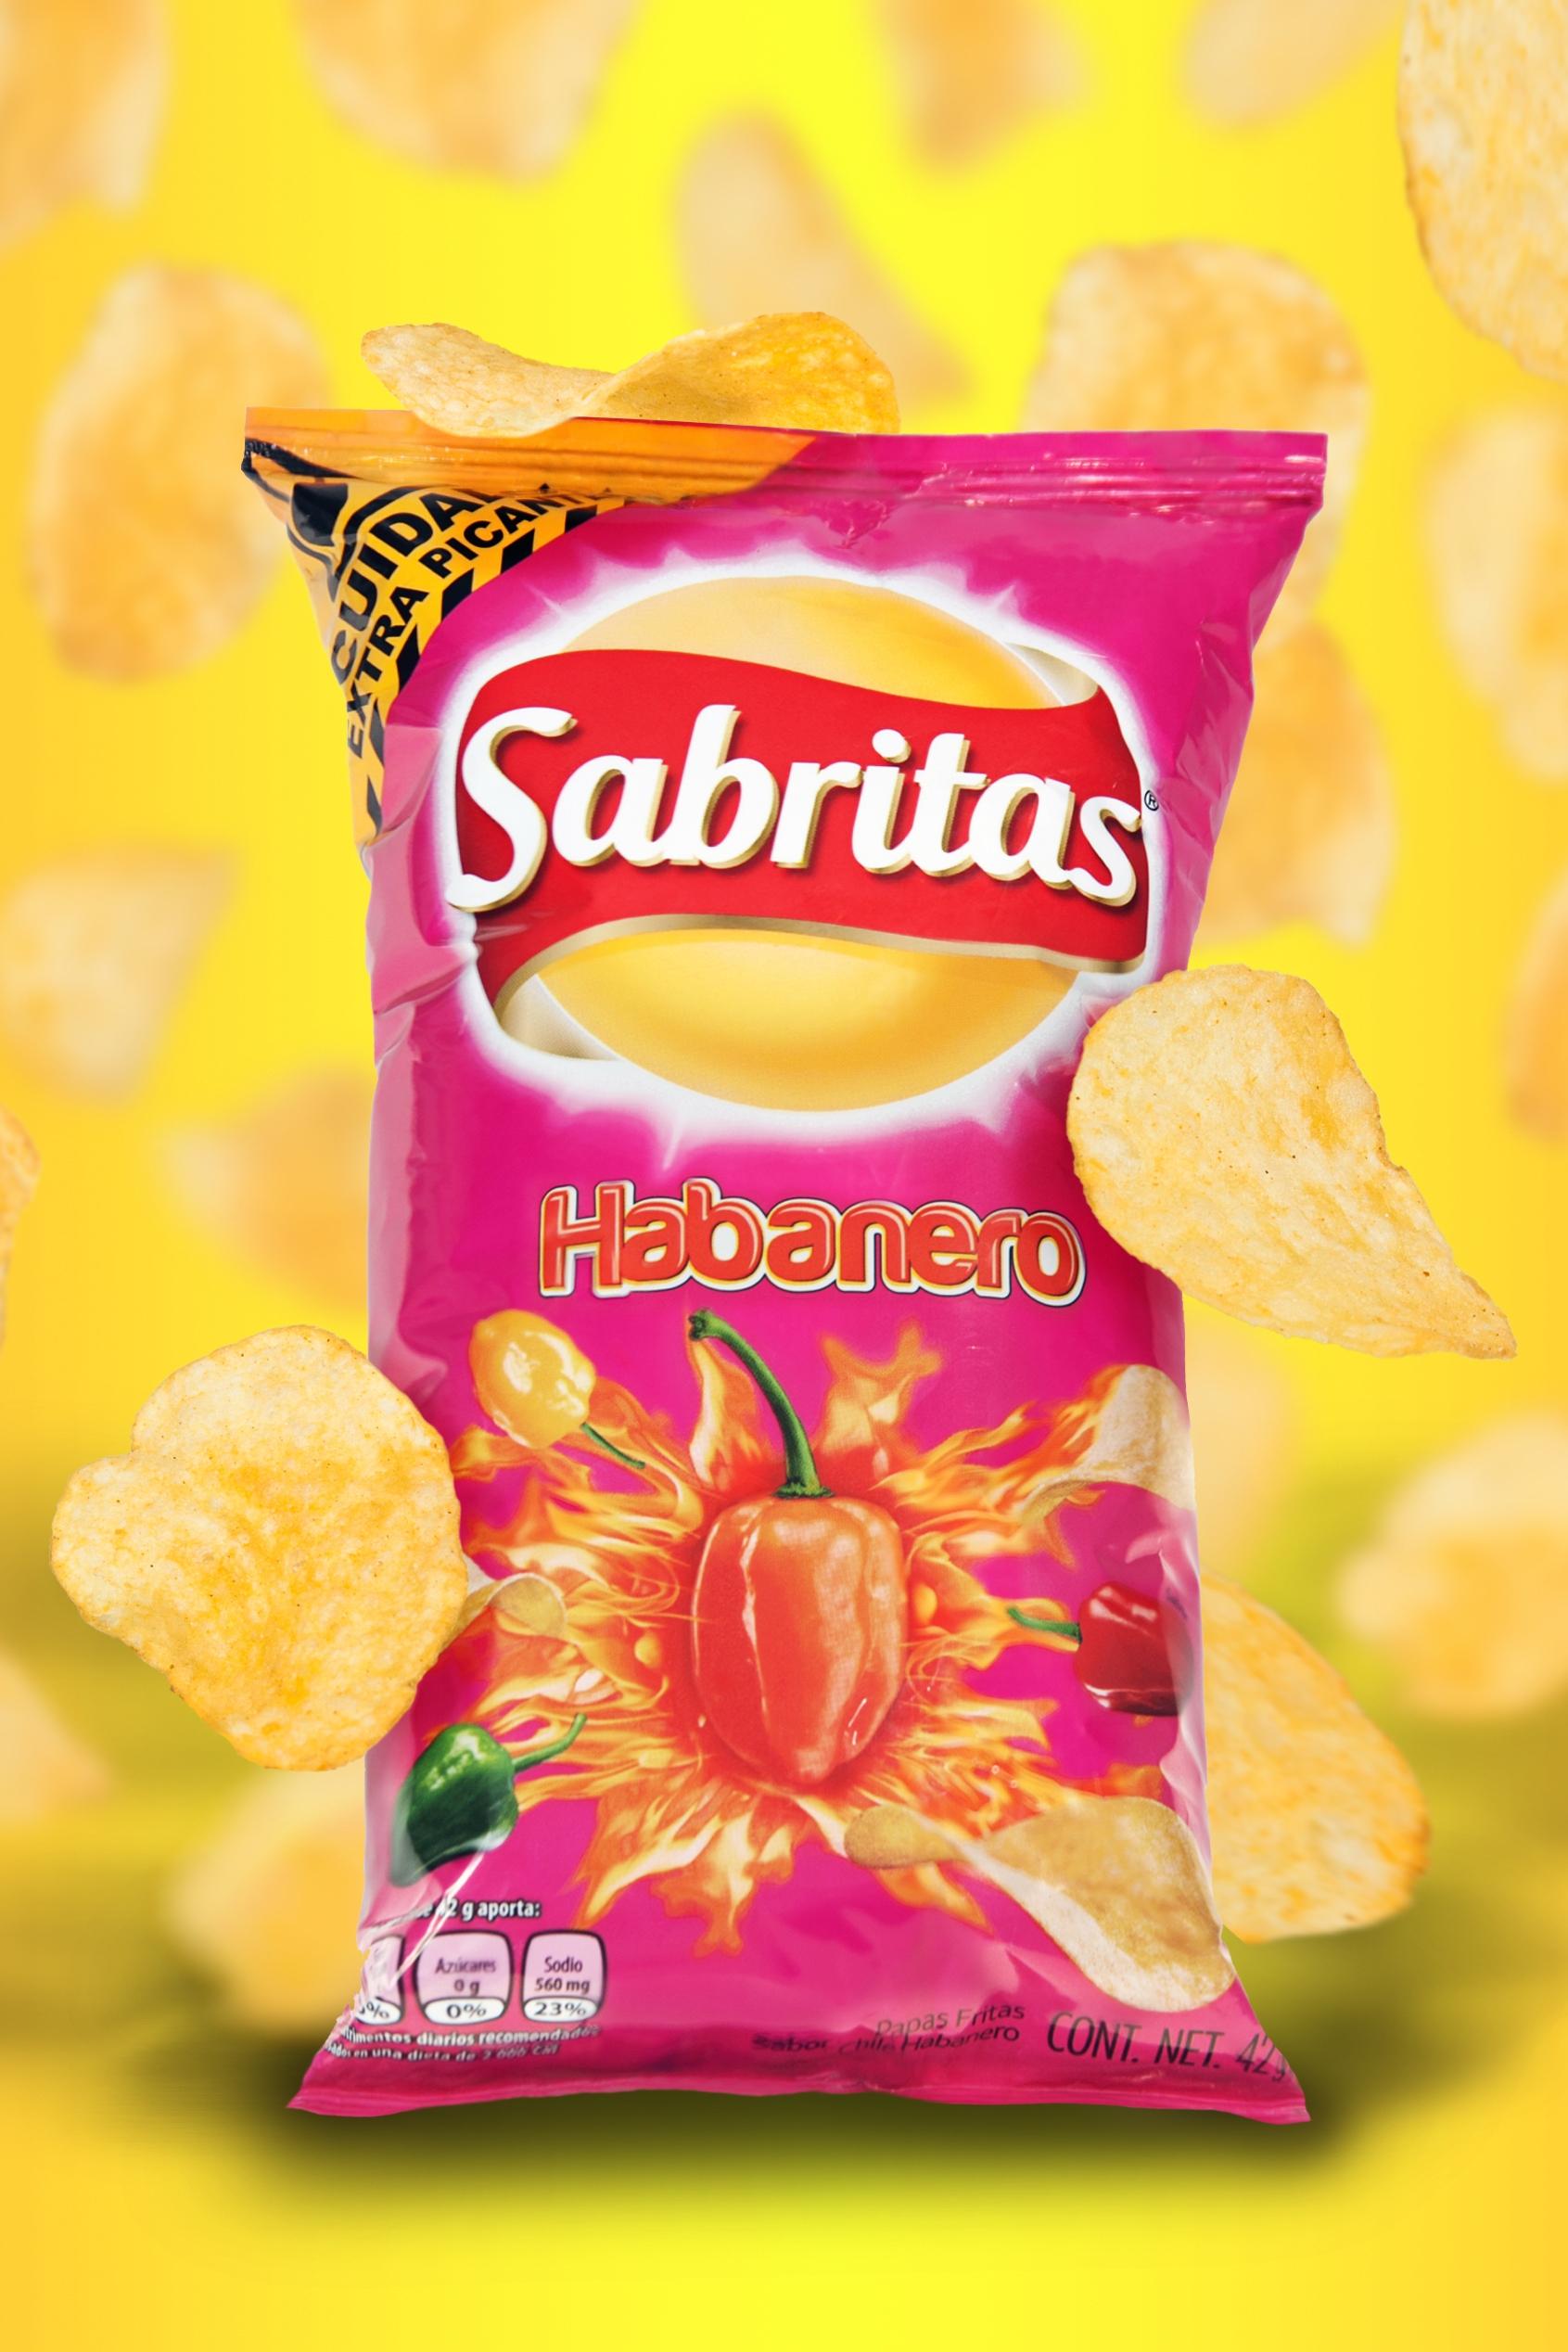 Sabritas - A.jpg